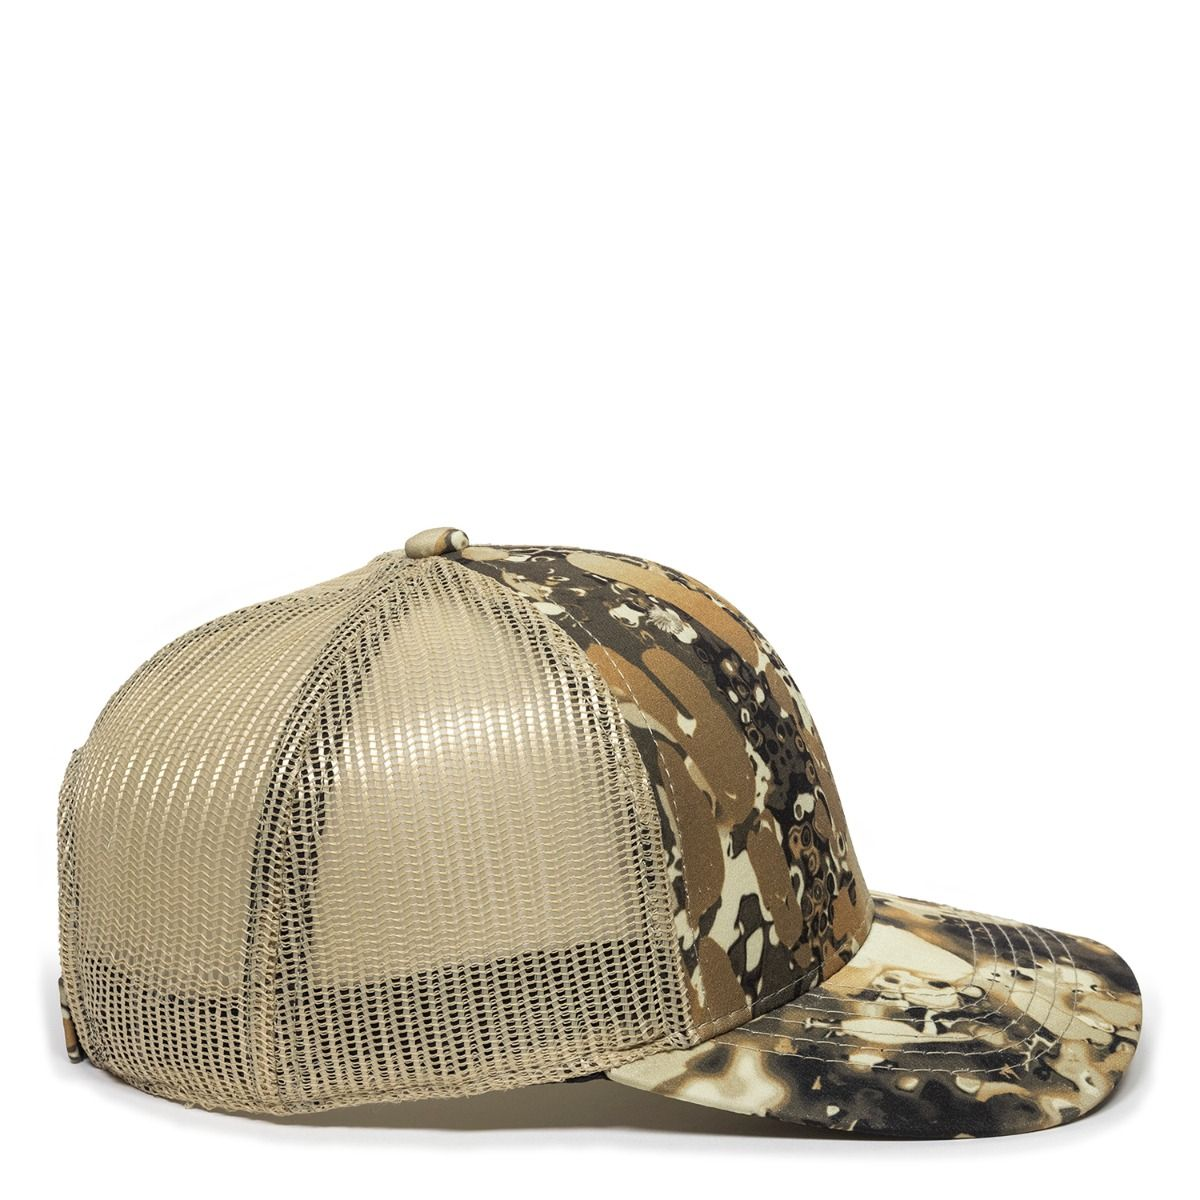 Outdoor Cap VEIL-001-V501 Veil Camo Avayde Natural Meshback Hat